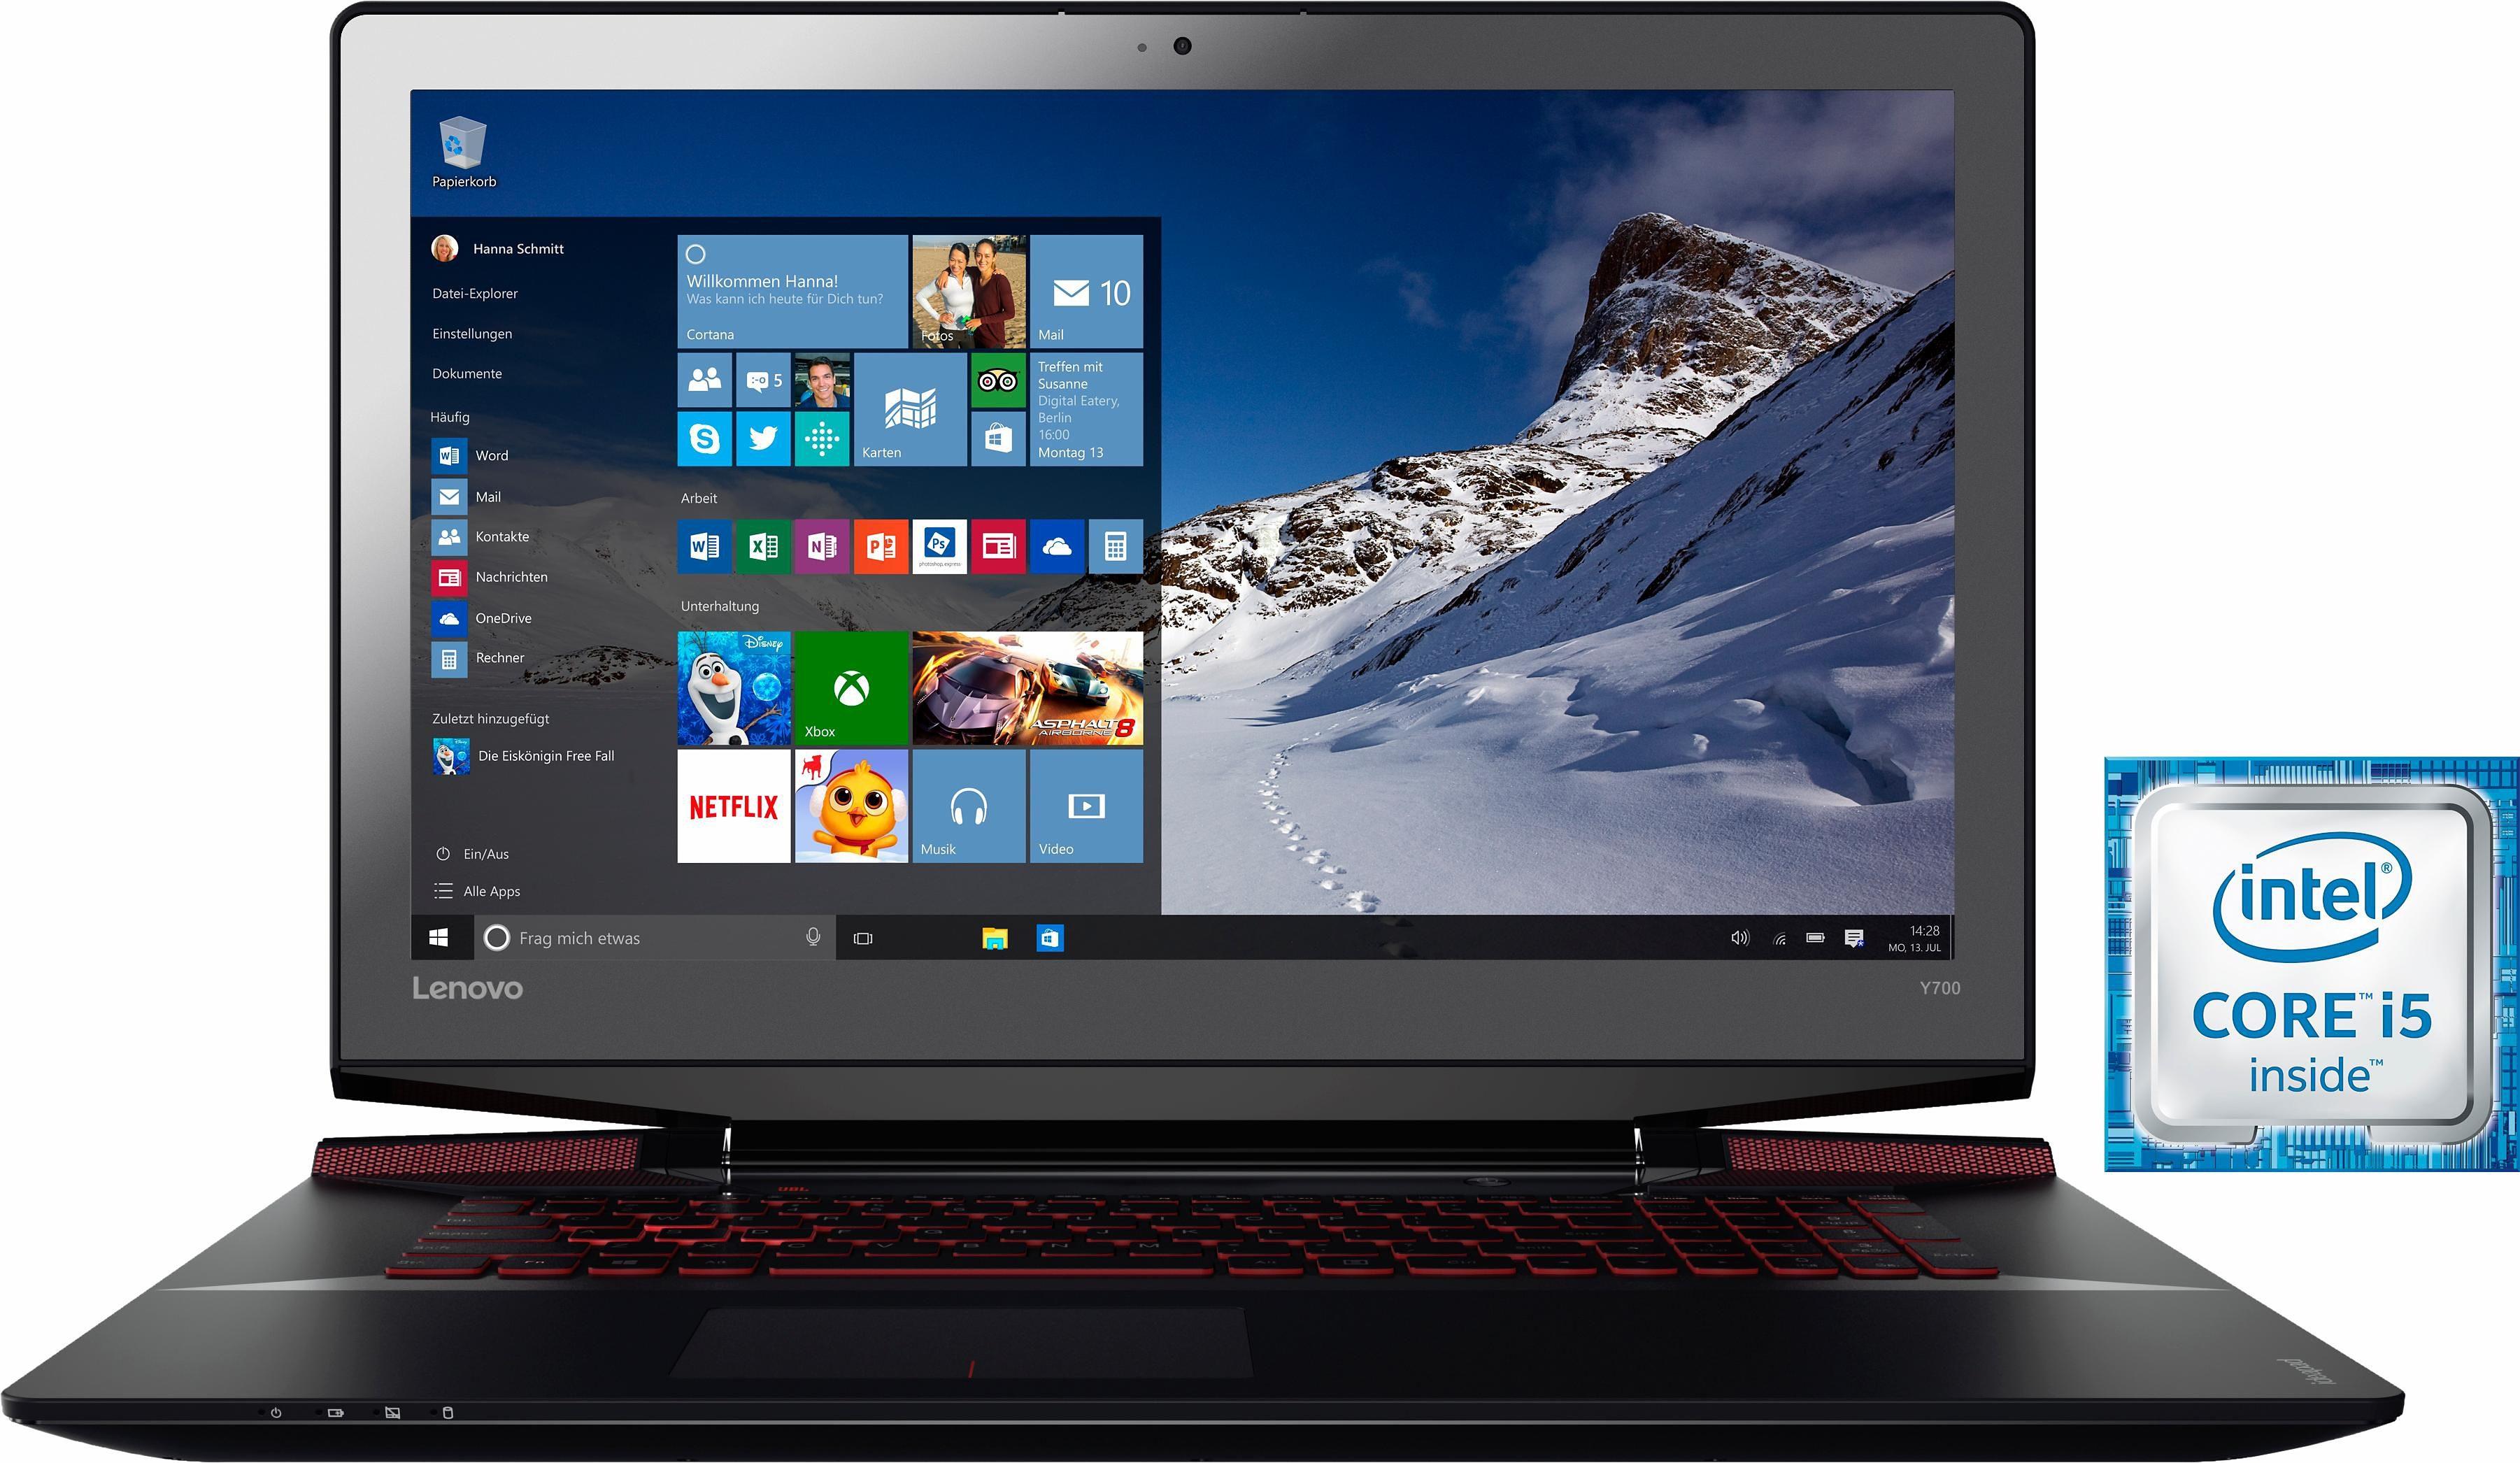 Lenovo IdeaPad Y700-17ISK Notebook, Intel® Core™ i5, 43,9 cm (17,3 Zoll), 1128 GB Speicher